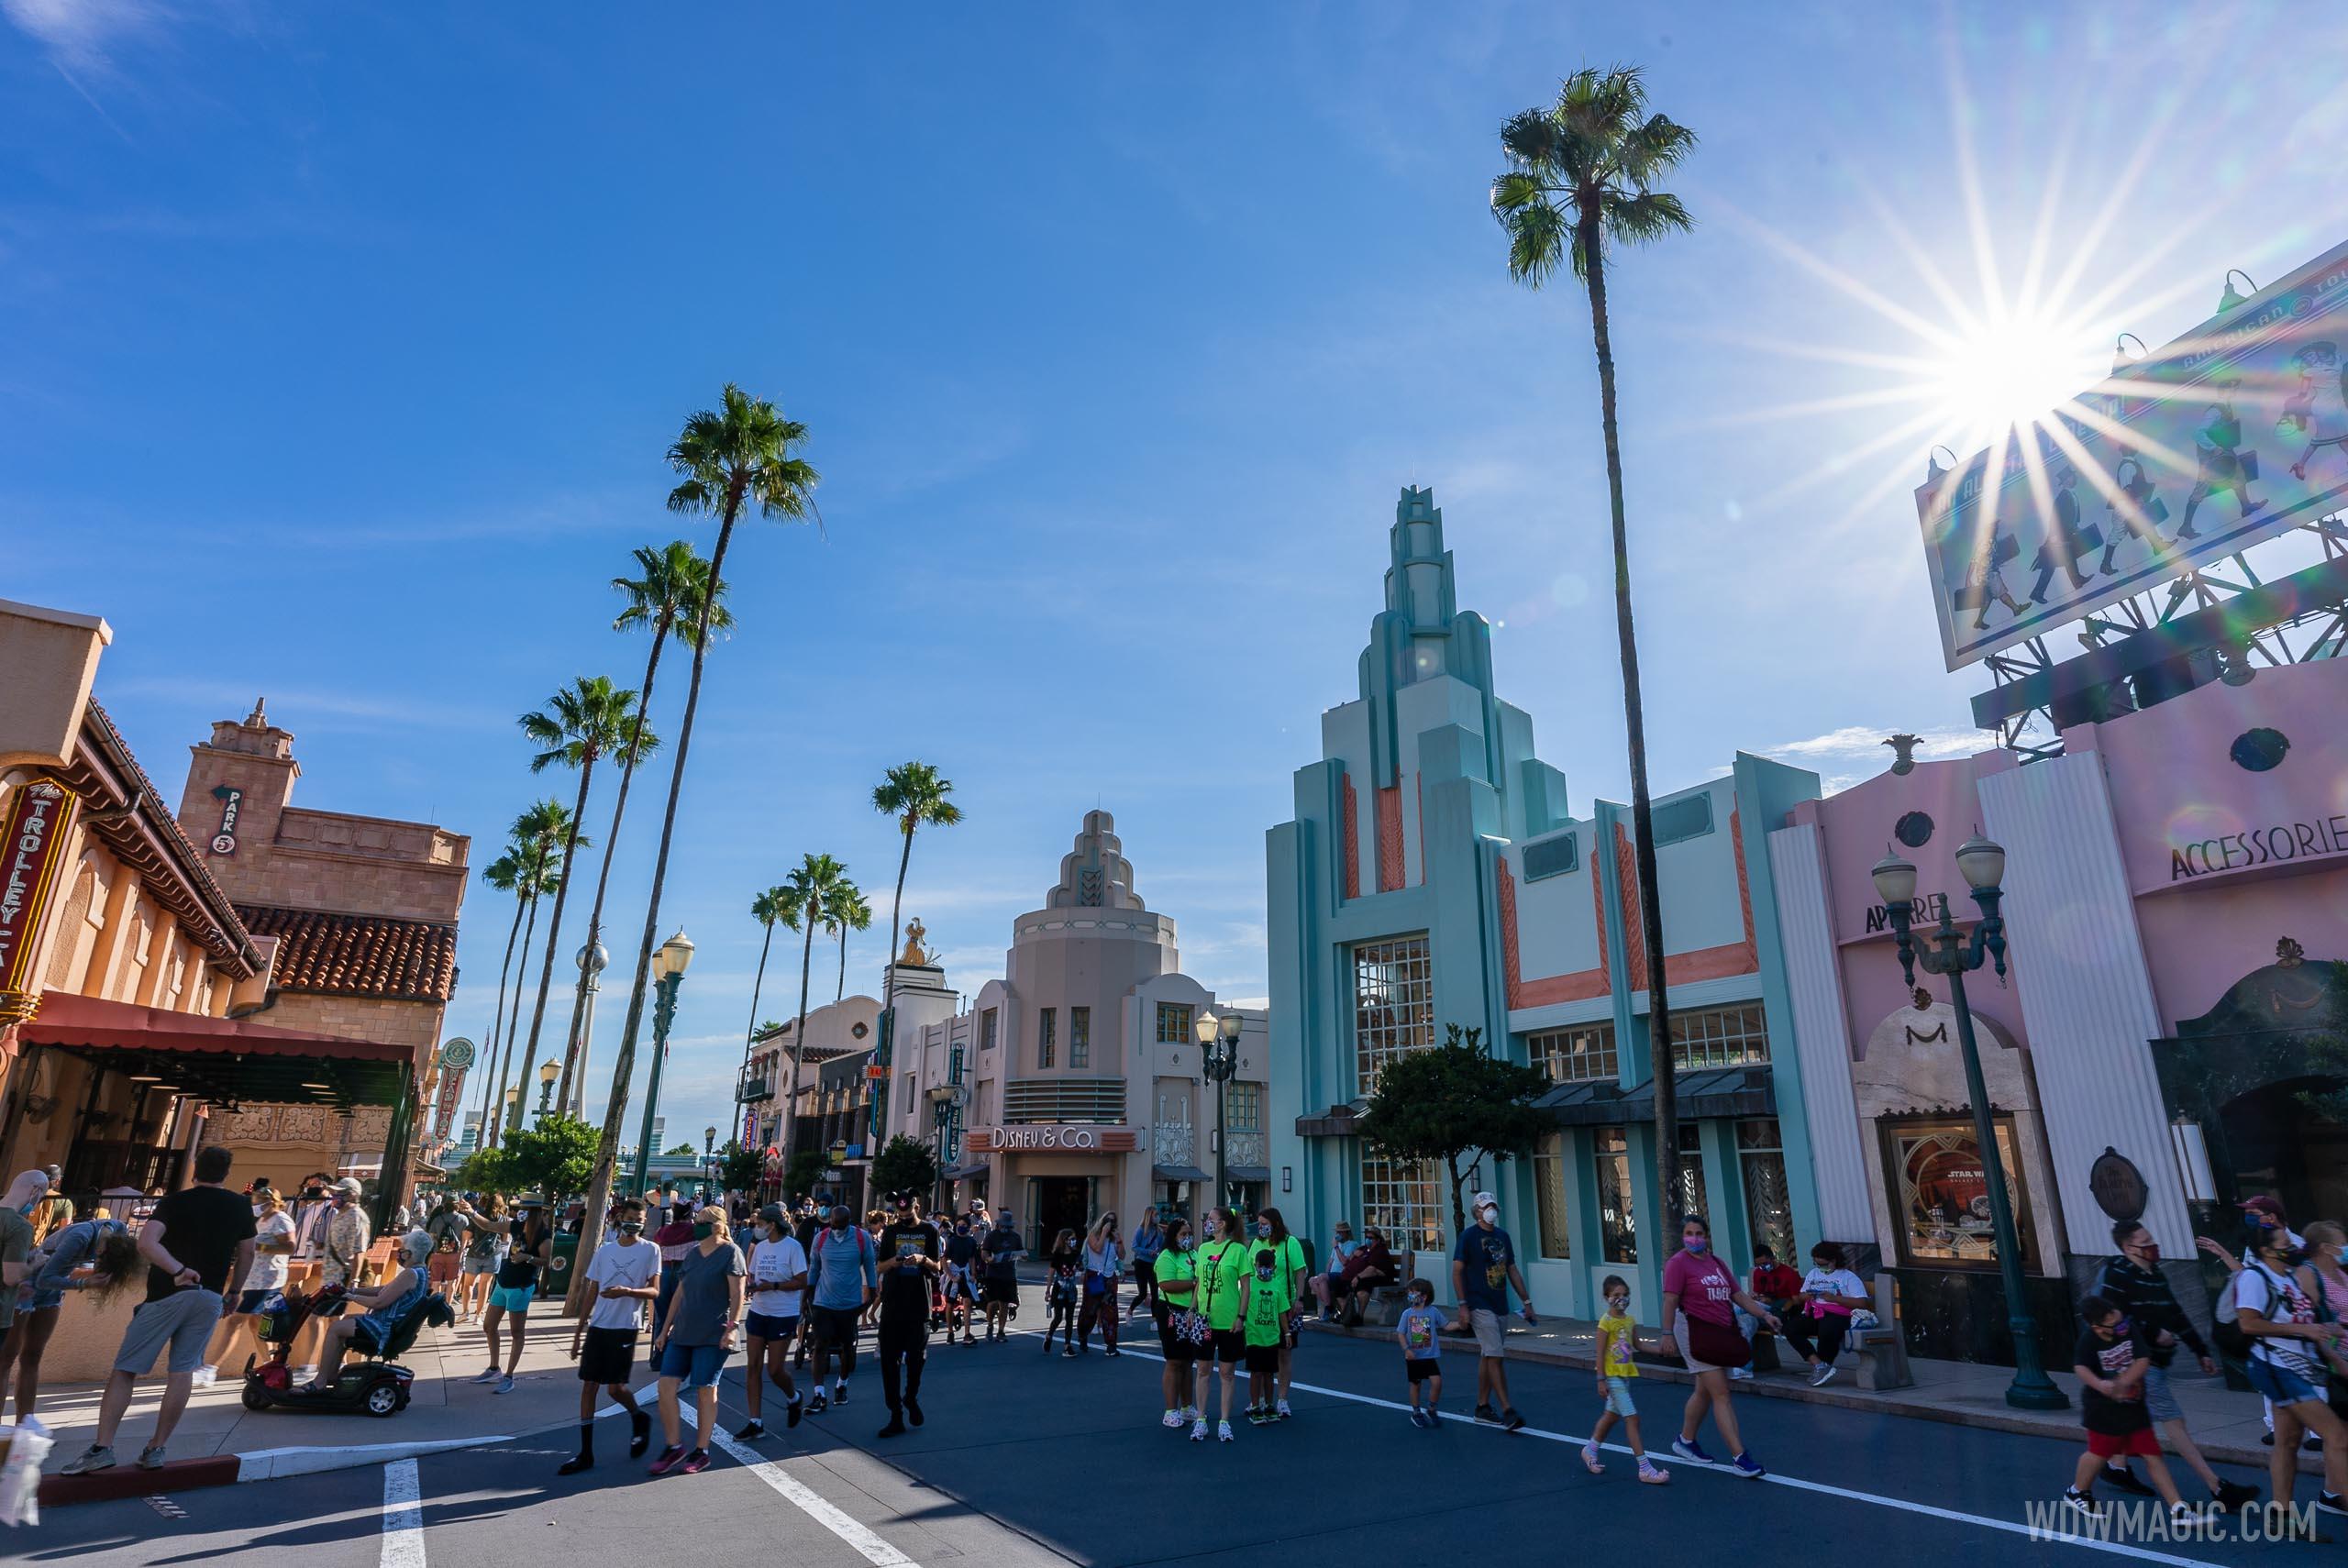 Guests on Hollywood Blvd at Disney's Hollywood Studios